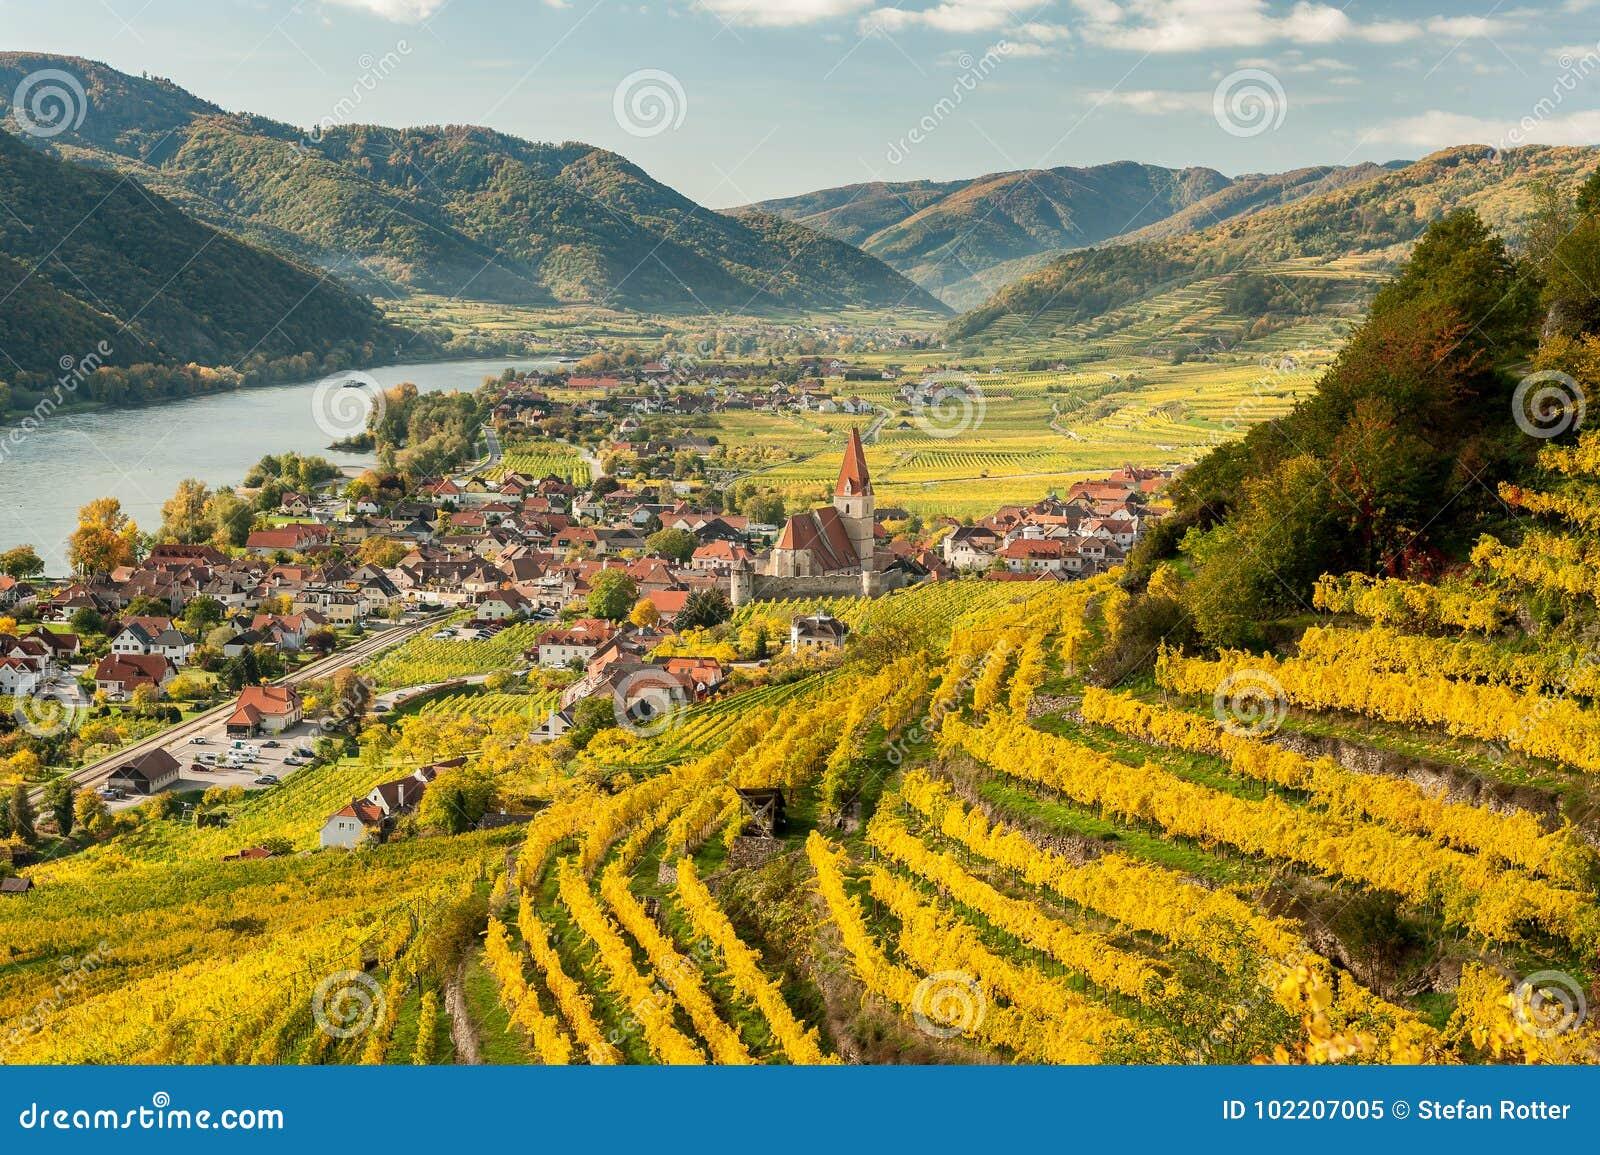 Weissenkirchen Wachau Austria en otoño coloreó las hojas y viney